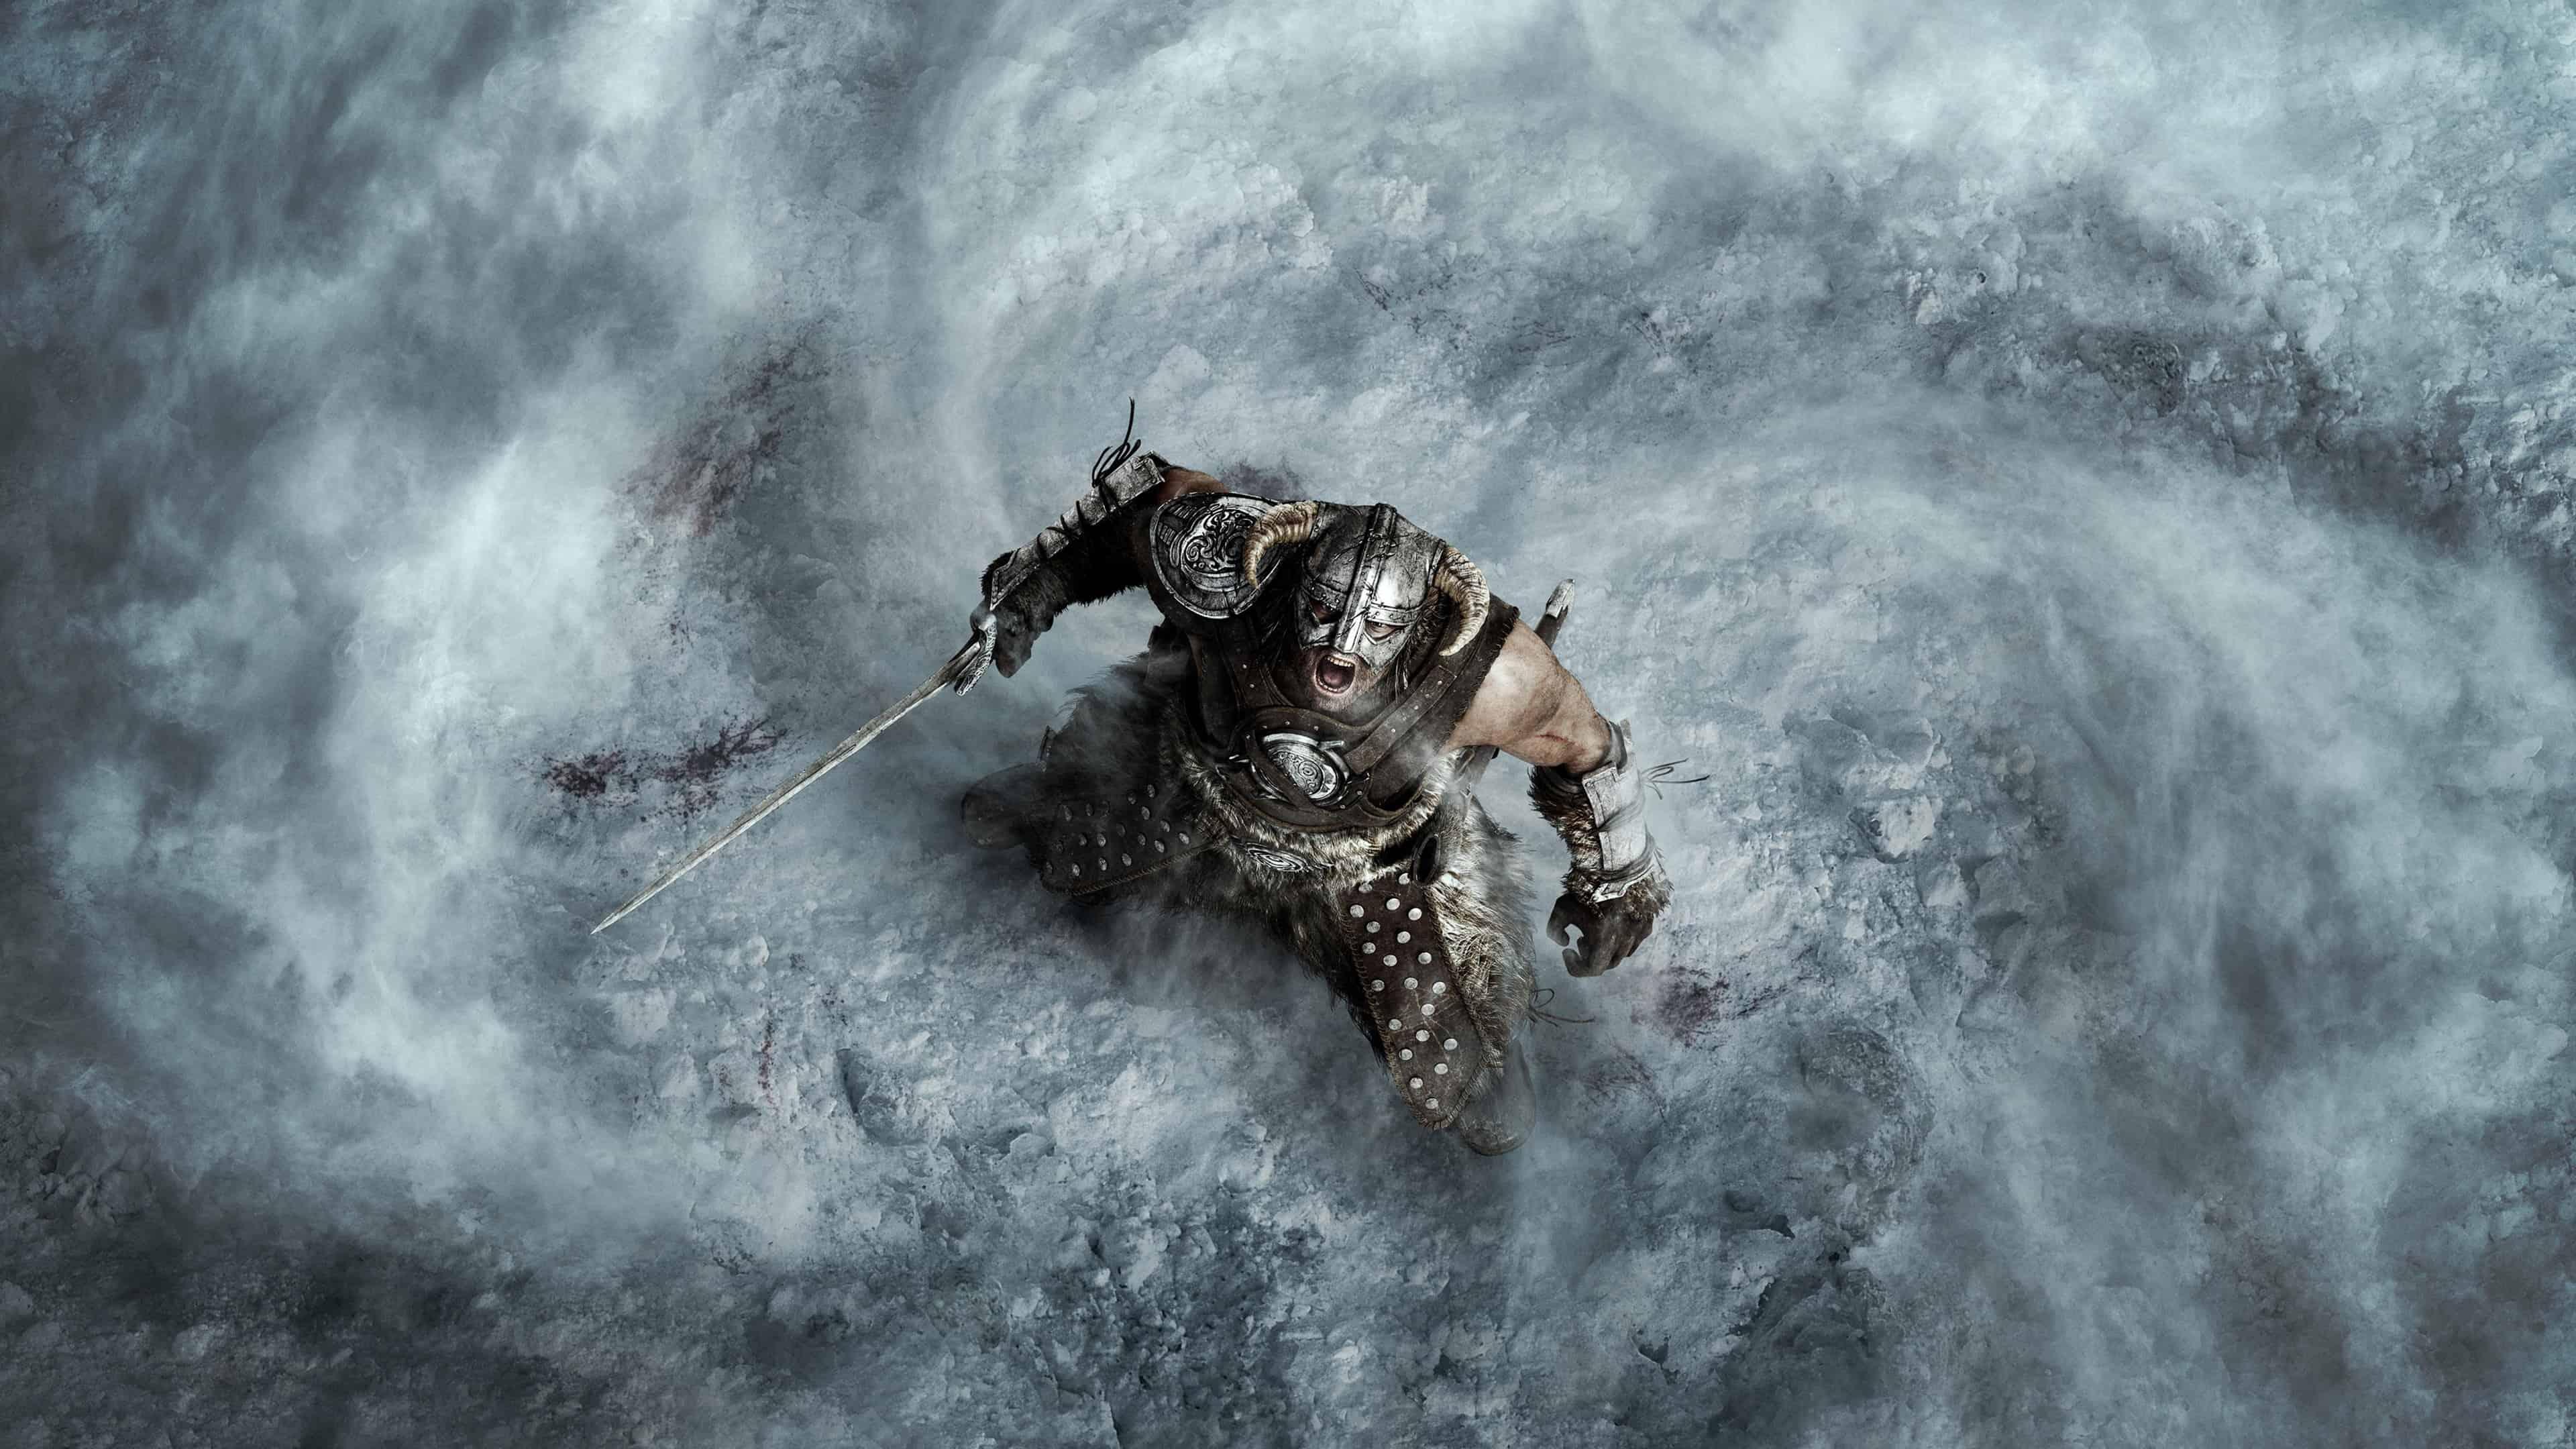 Skyrim Dragonborn Uhd 4k Wallpaper Pixelz